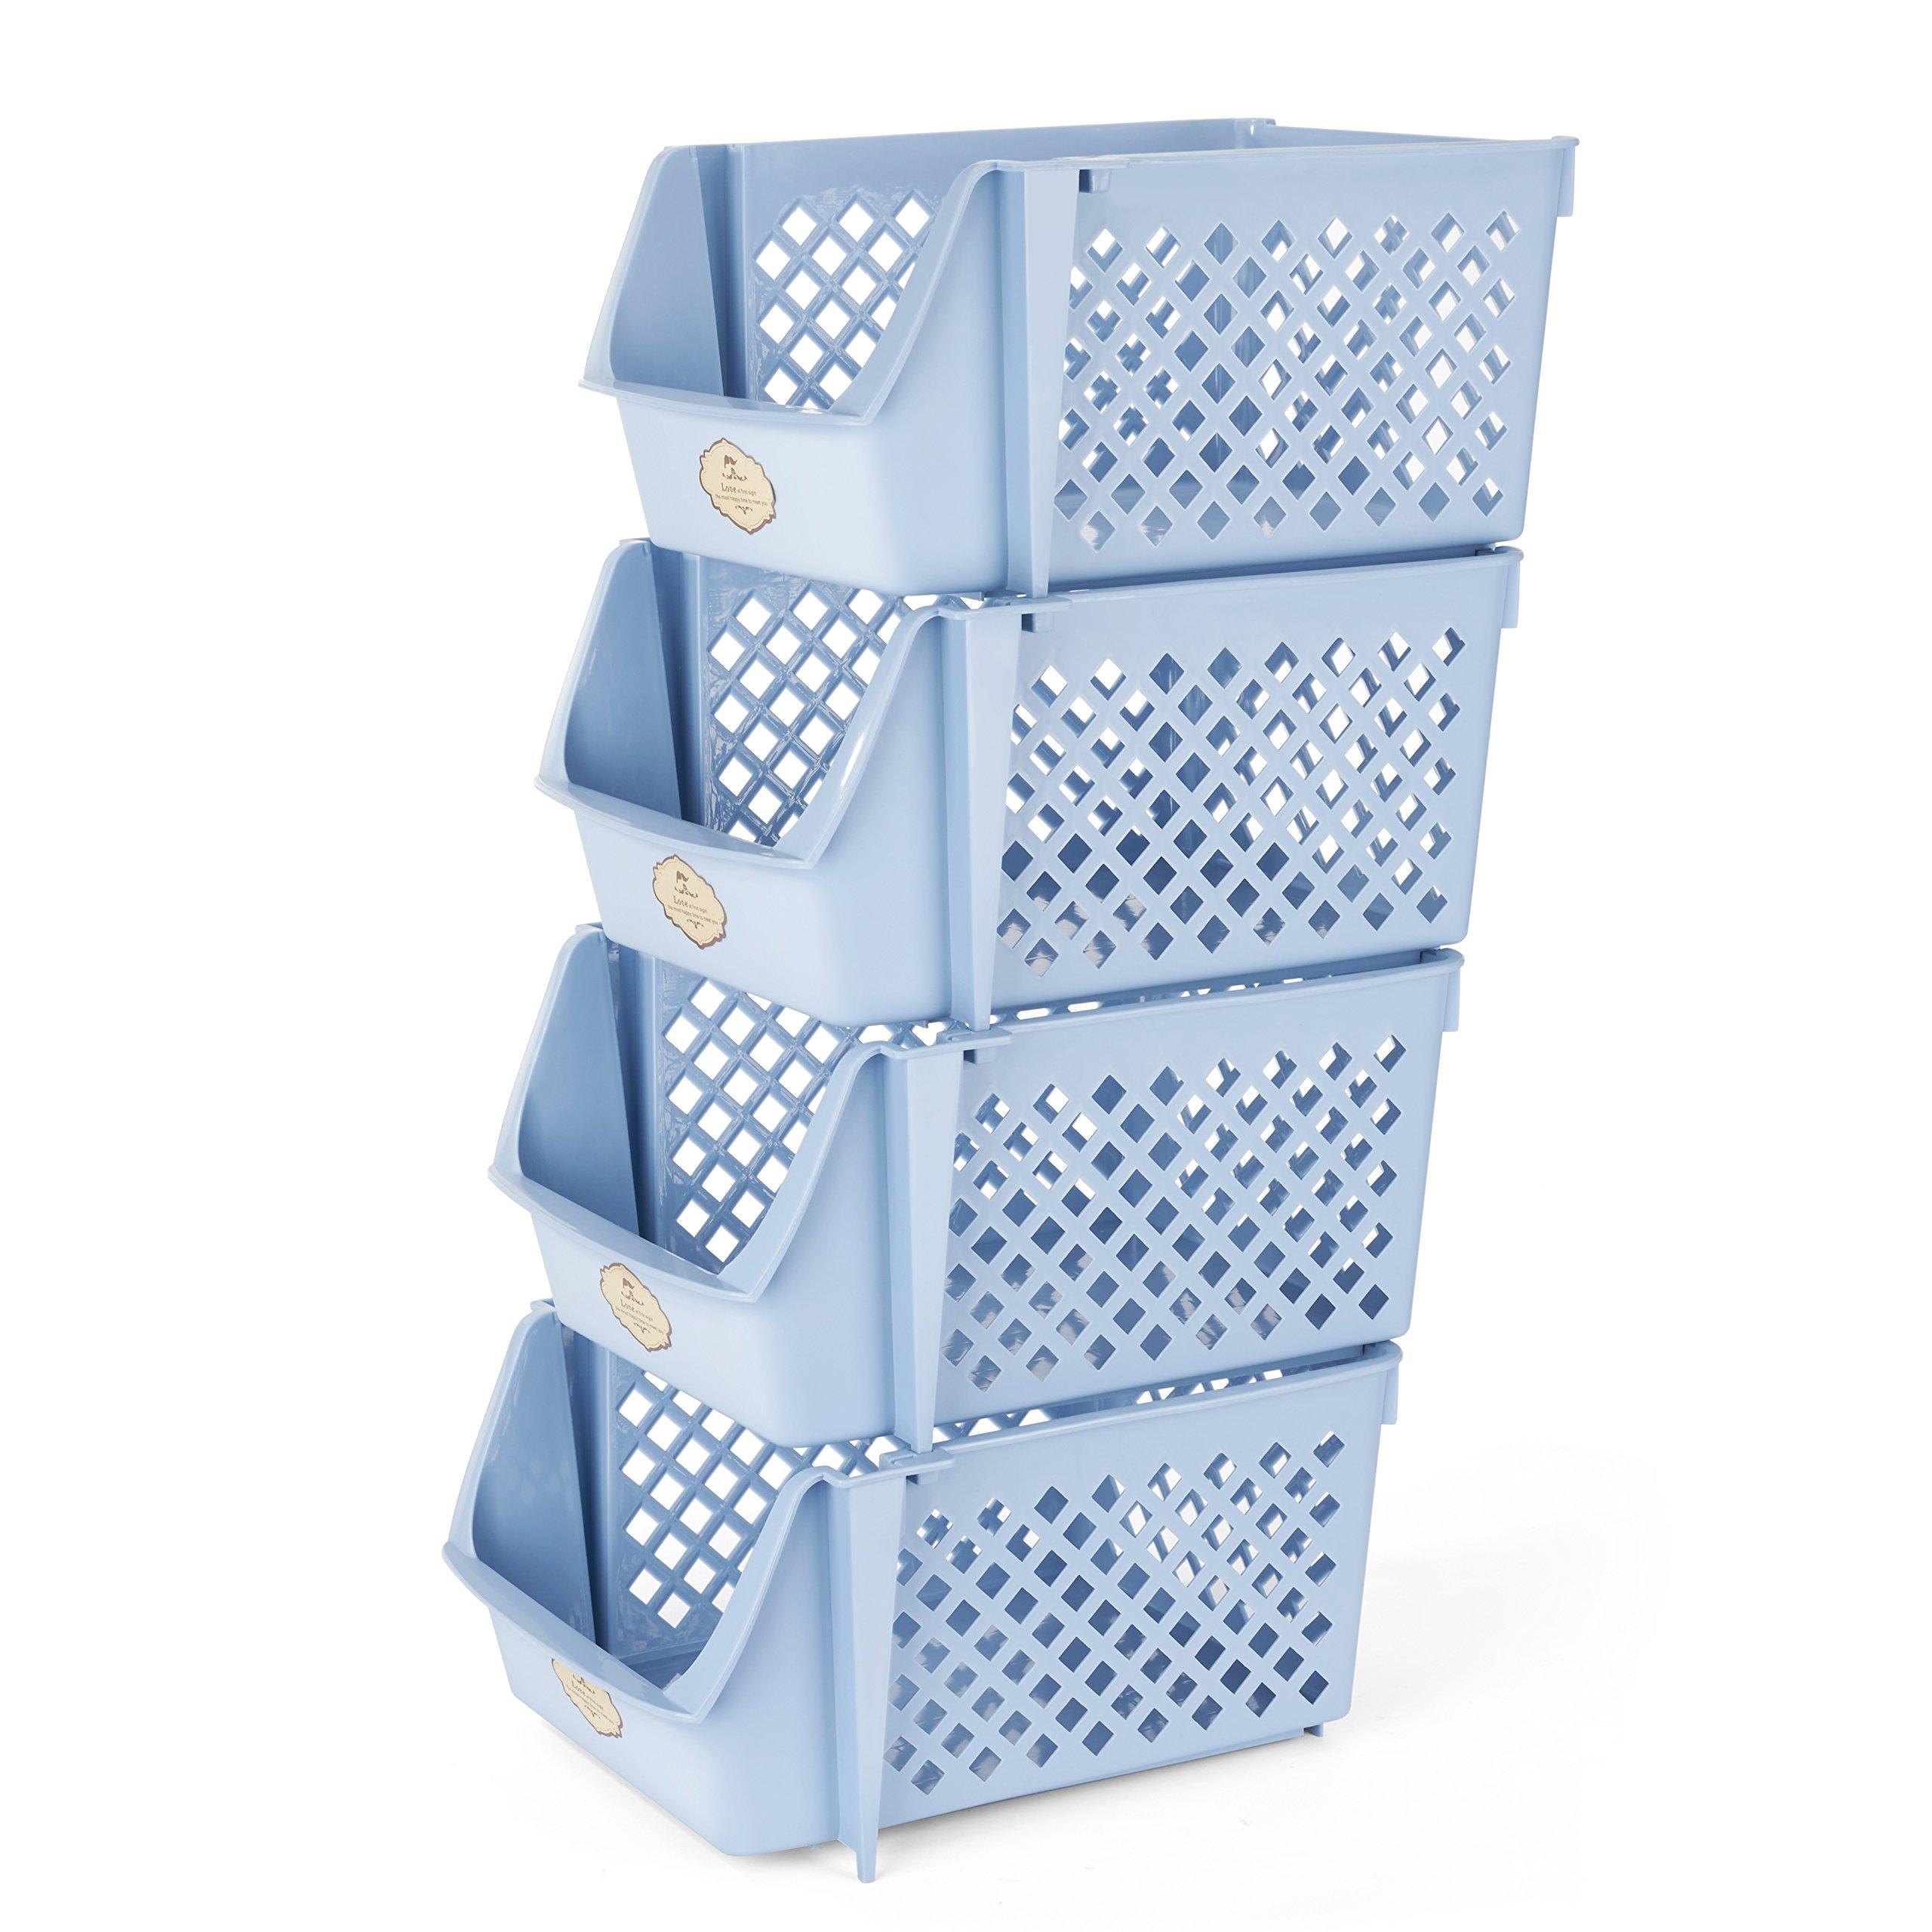 Titan Mall Supplies Storage Bins Stackable Storage Bins for, Files, Beers, Snacks 15 X 10 X 7 Inch/bin, Set of 4, Blue